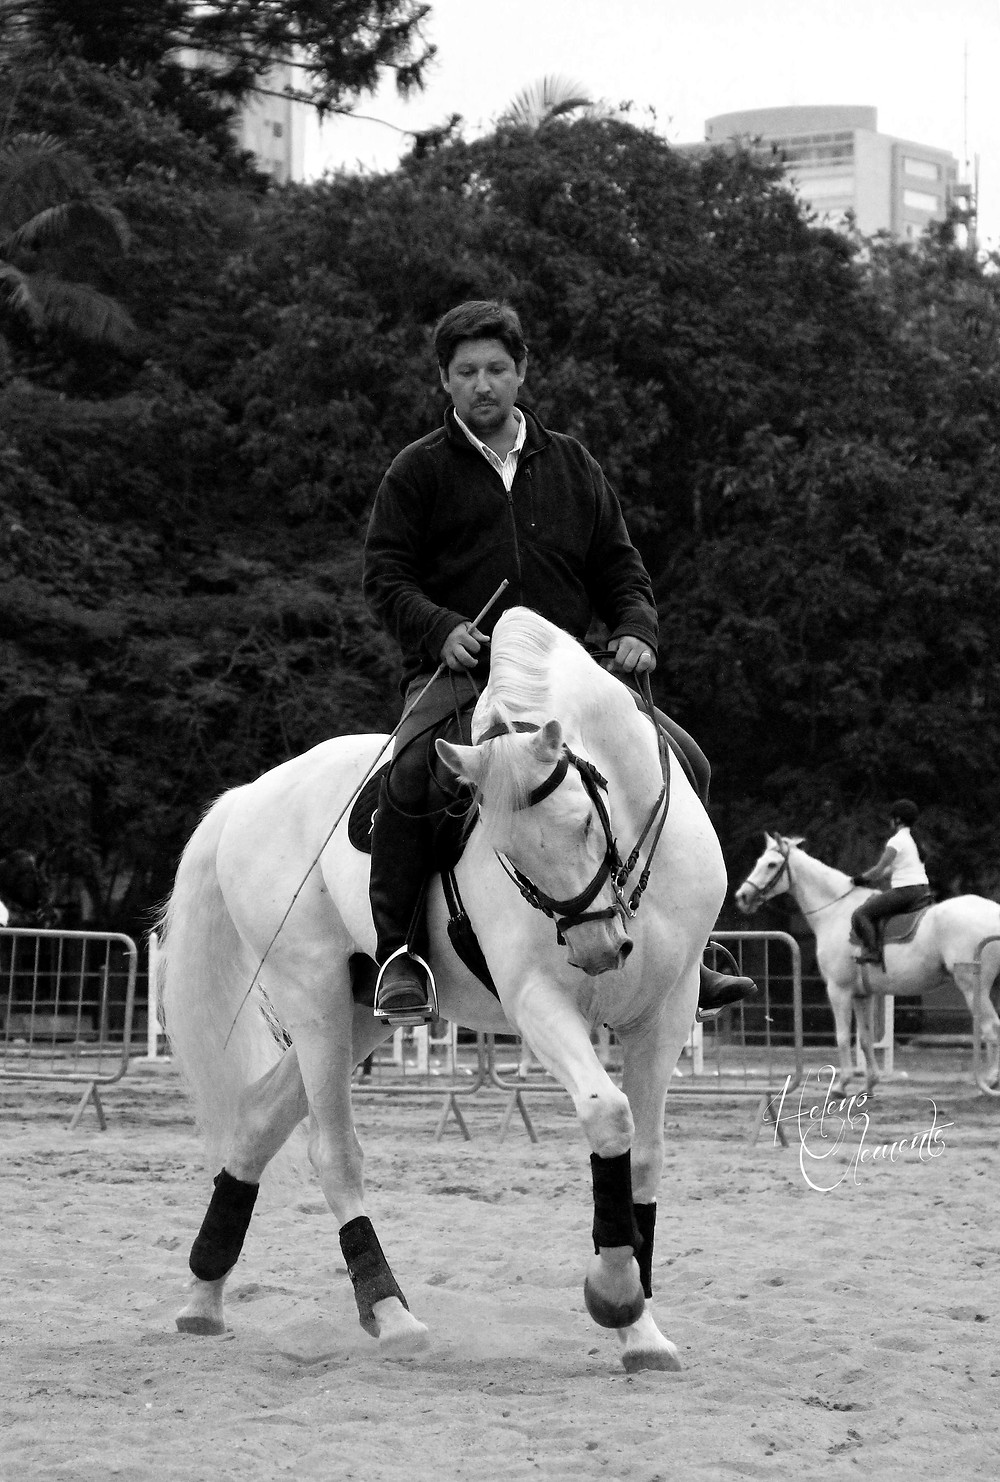 Adestramento clássico no Parque da Água Branca, durante a Expo Cavalos